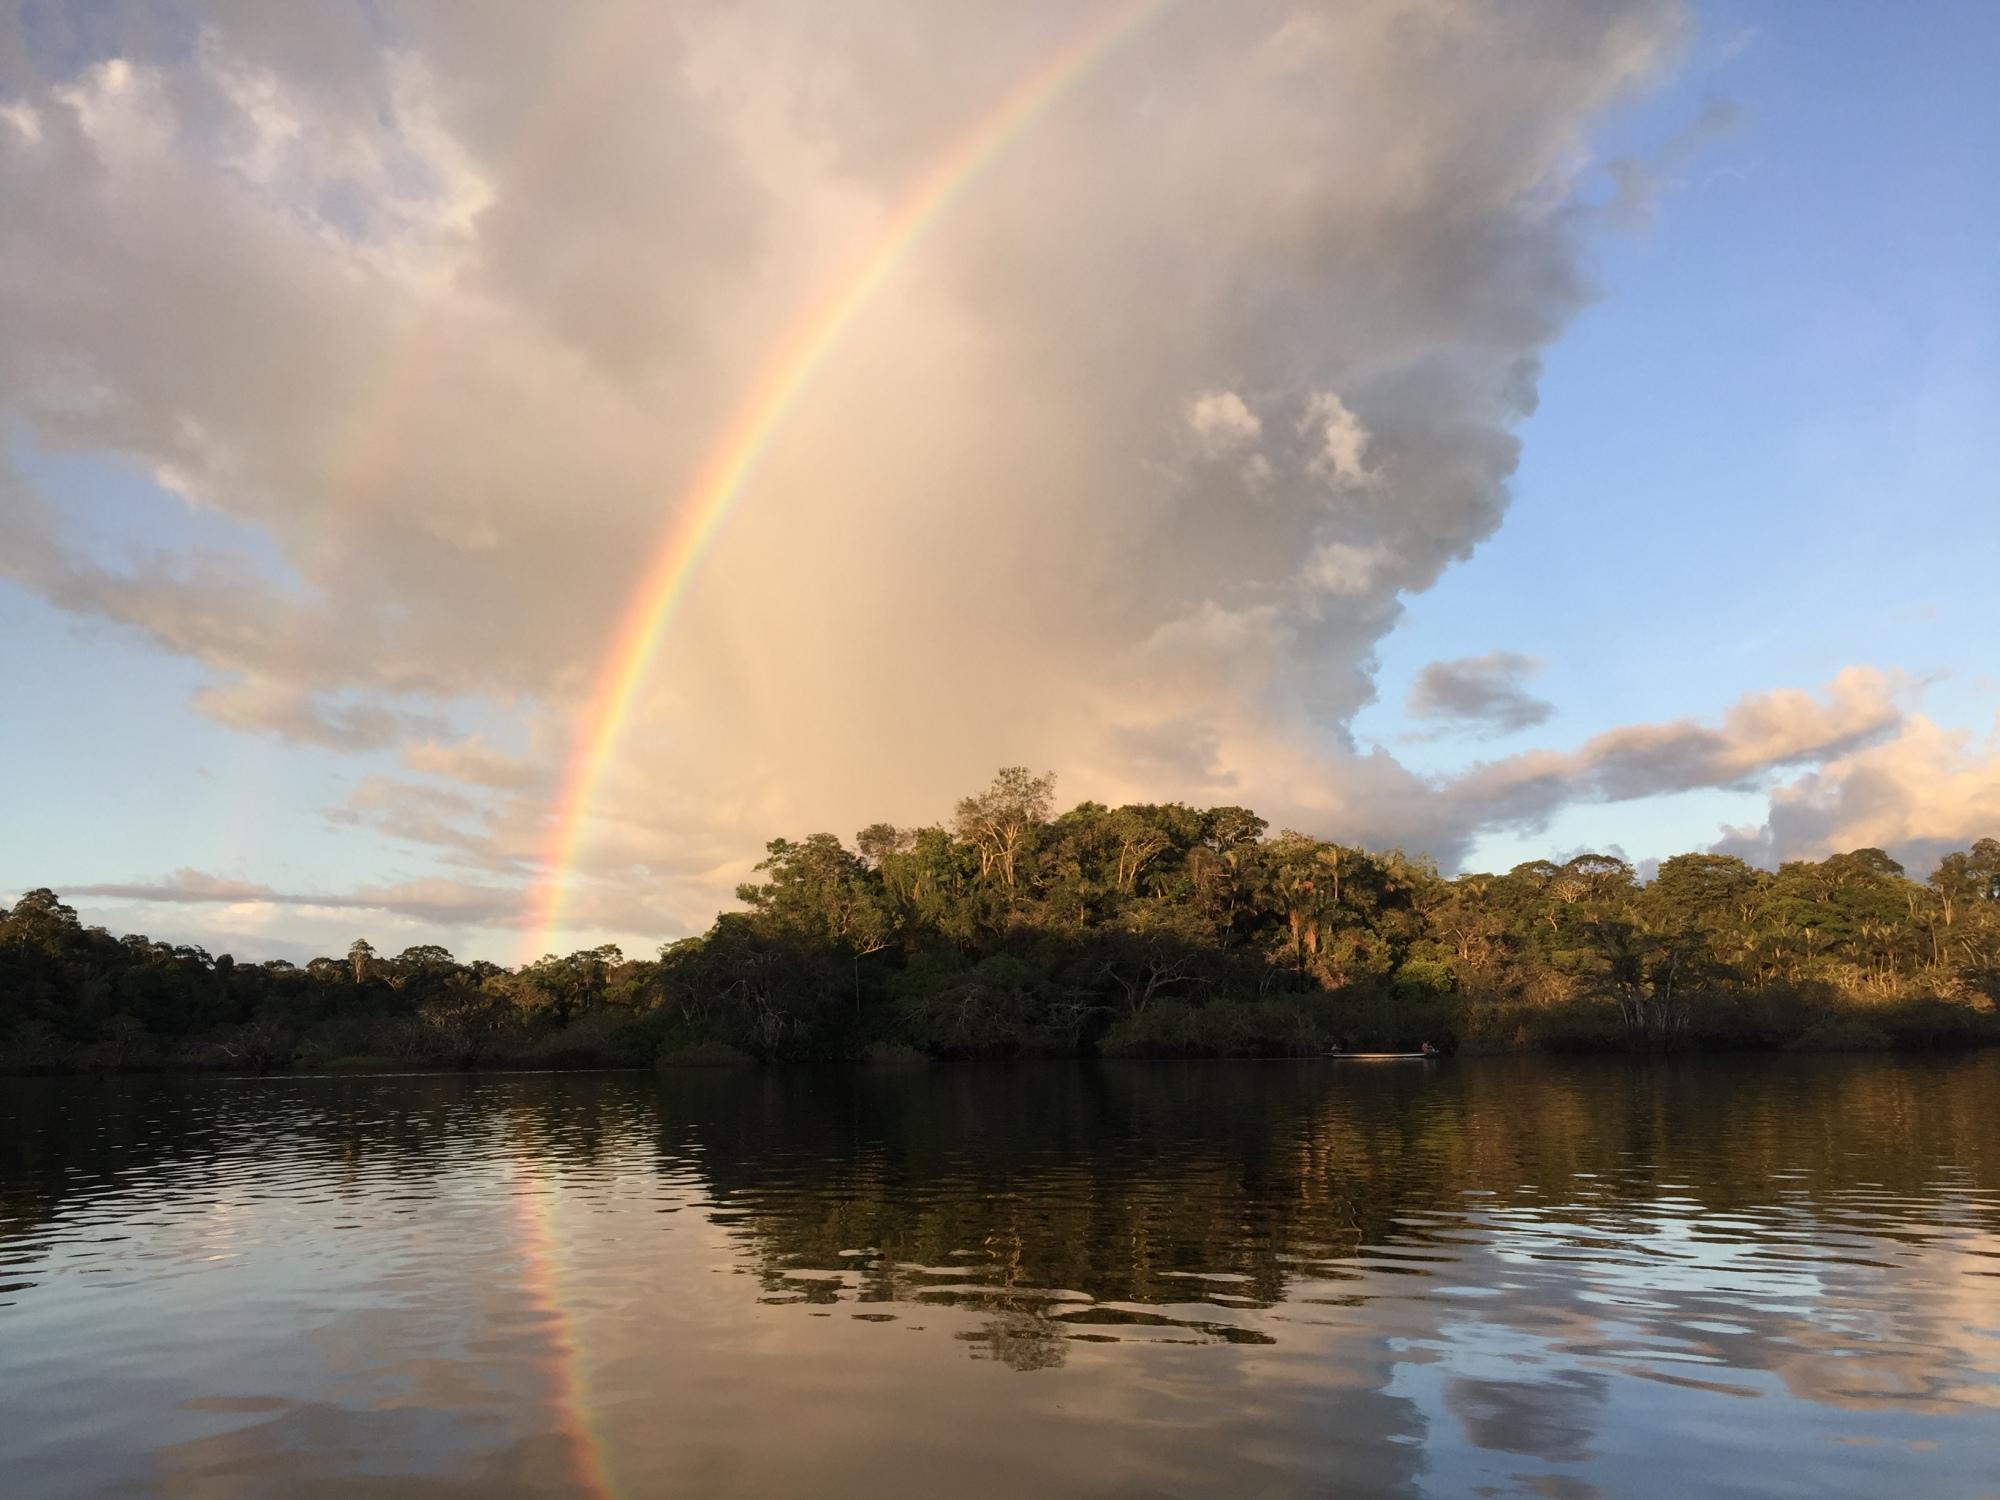 Doppelter Regenbogen über den Mangroven